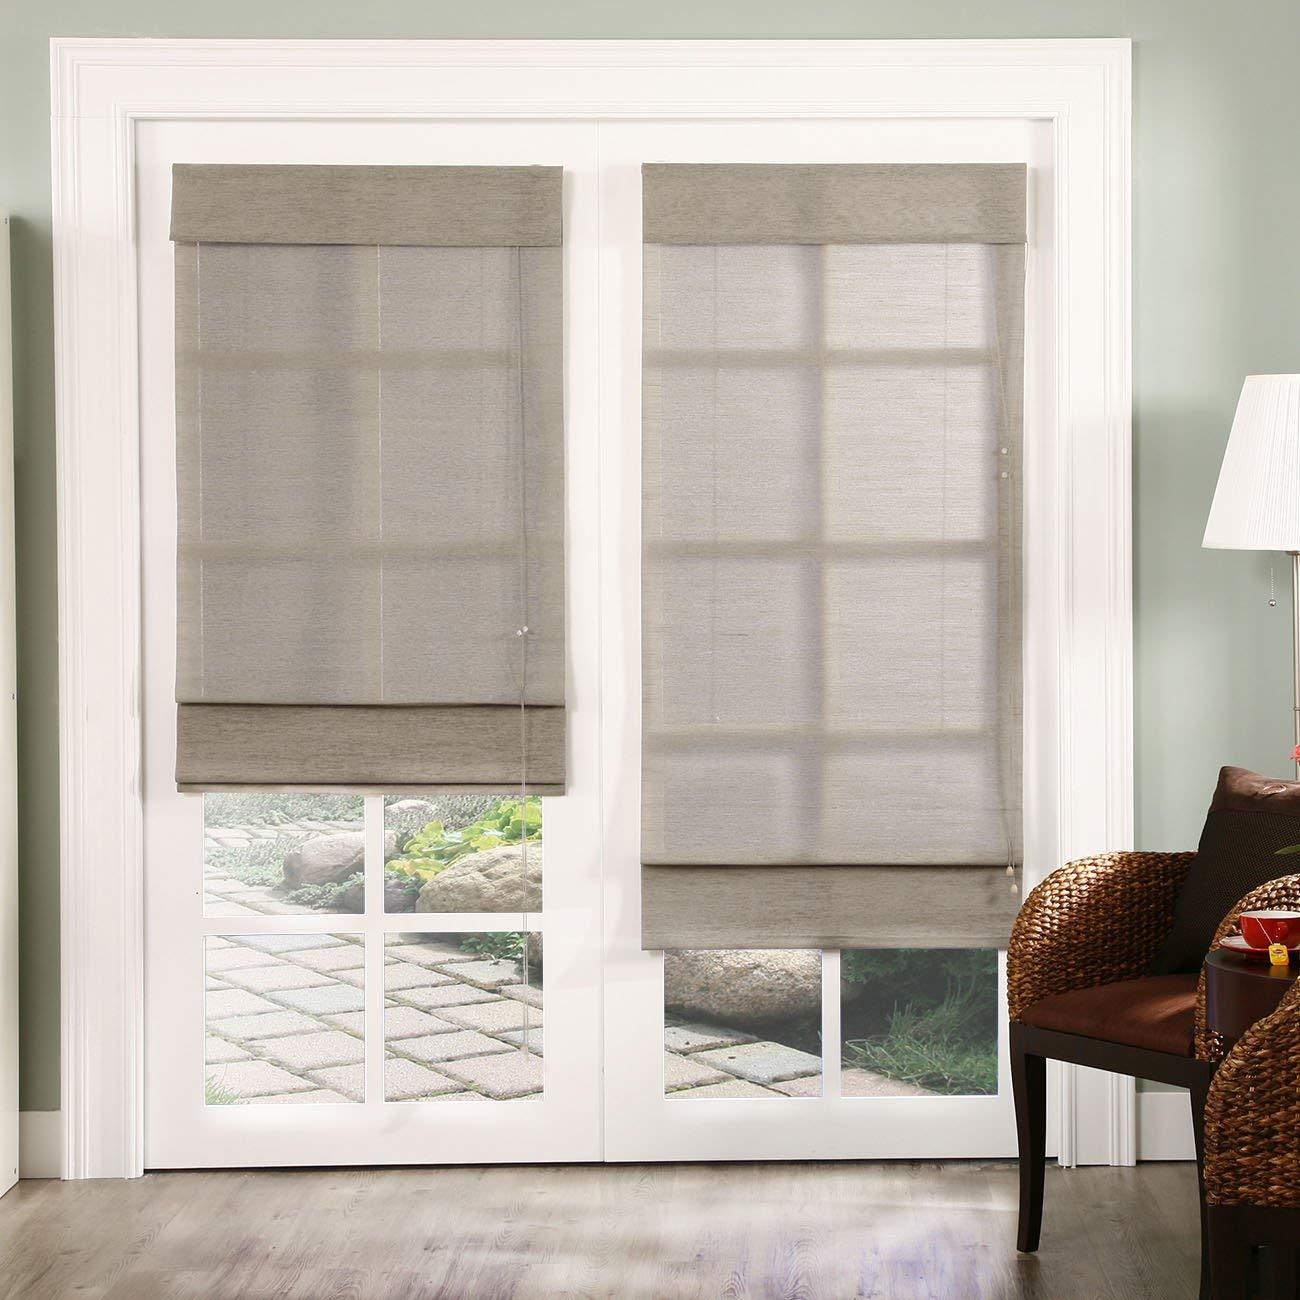 fabric shades amazon.com: chicology standard cord lift roman shades jute fabric window  blind DMXLIBS